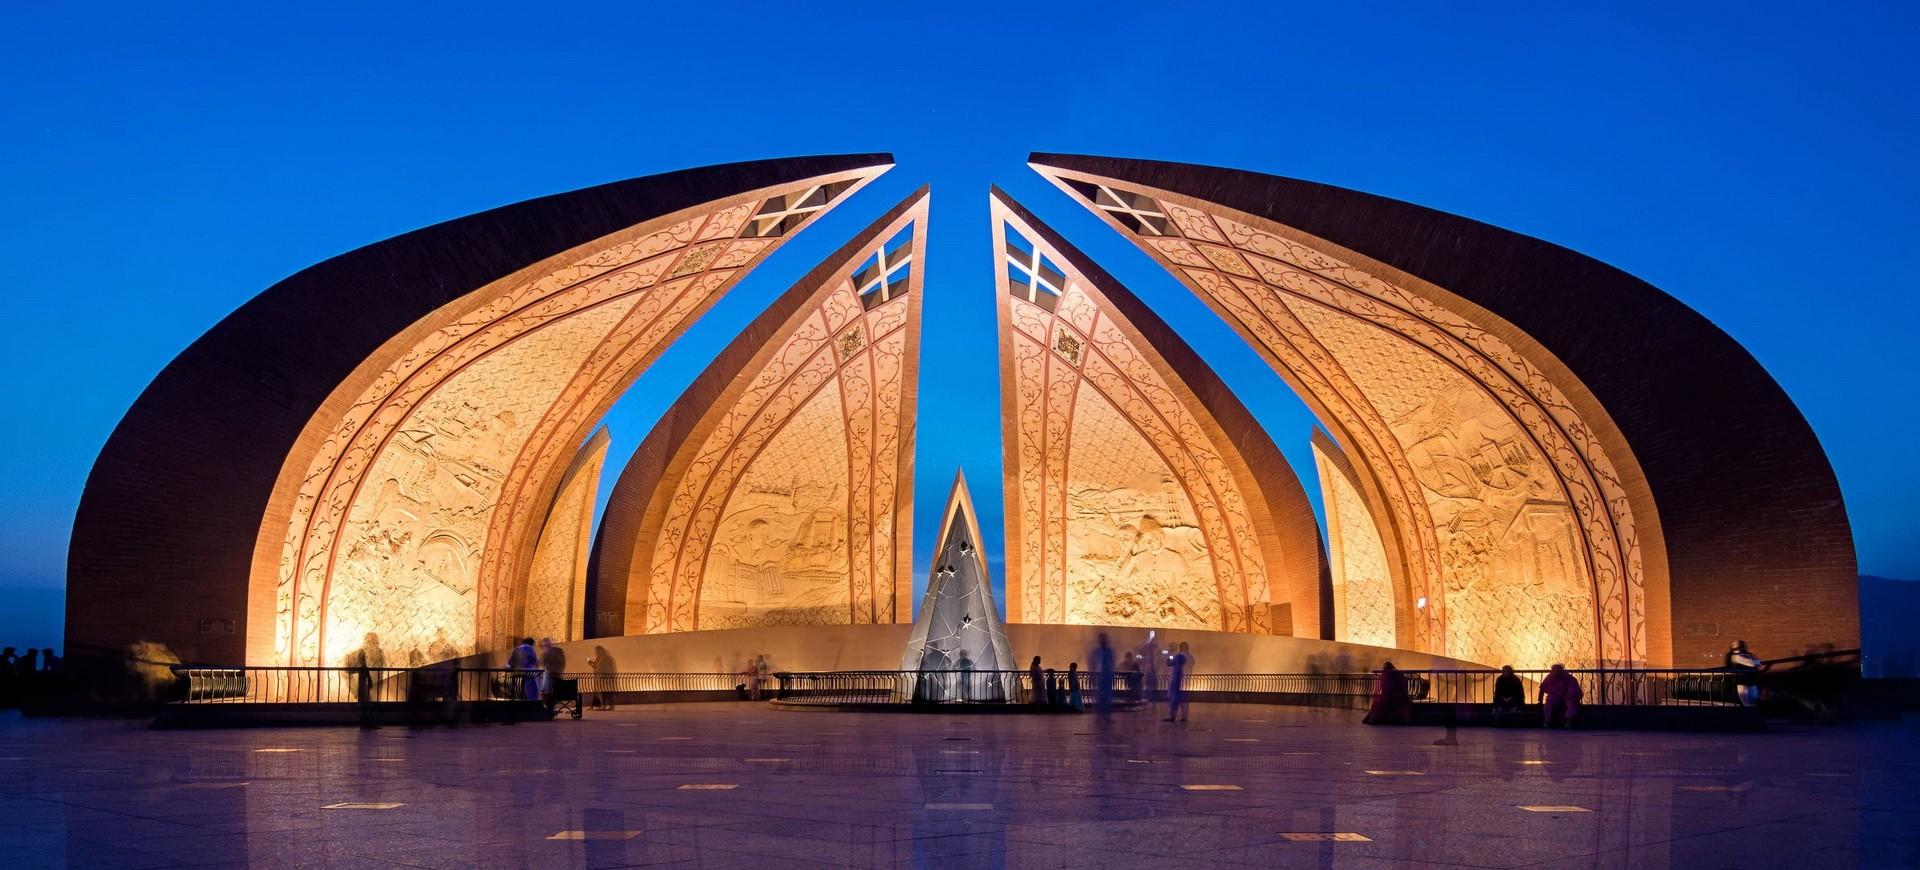 Pakistan Monument à Islamabad